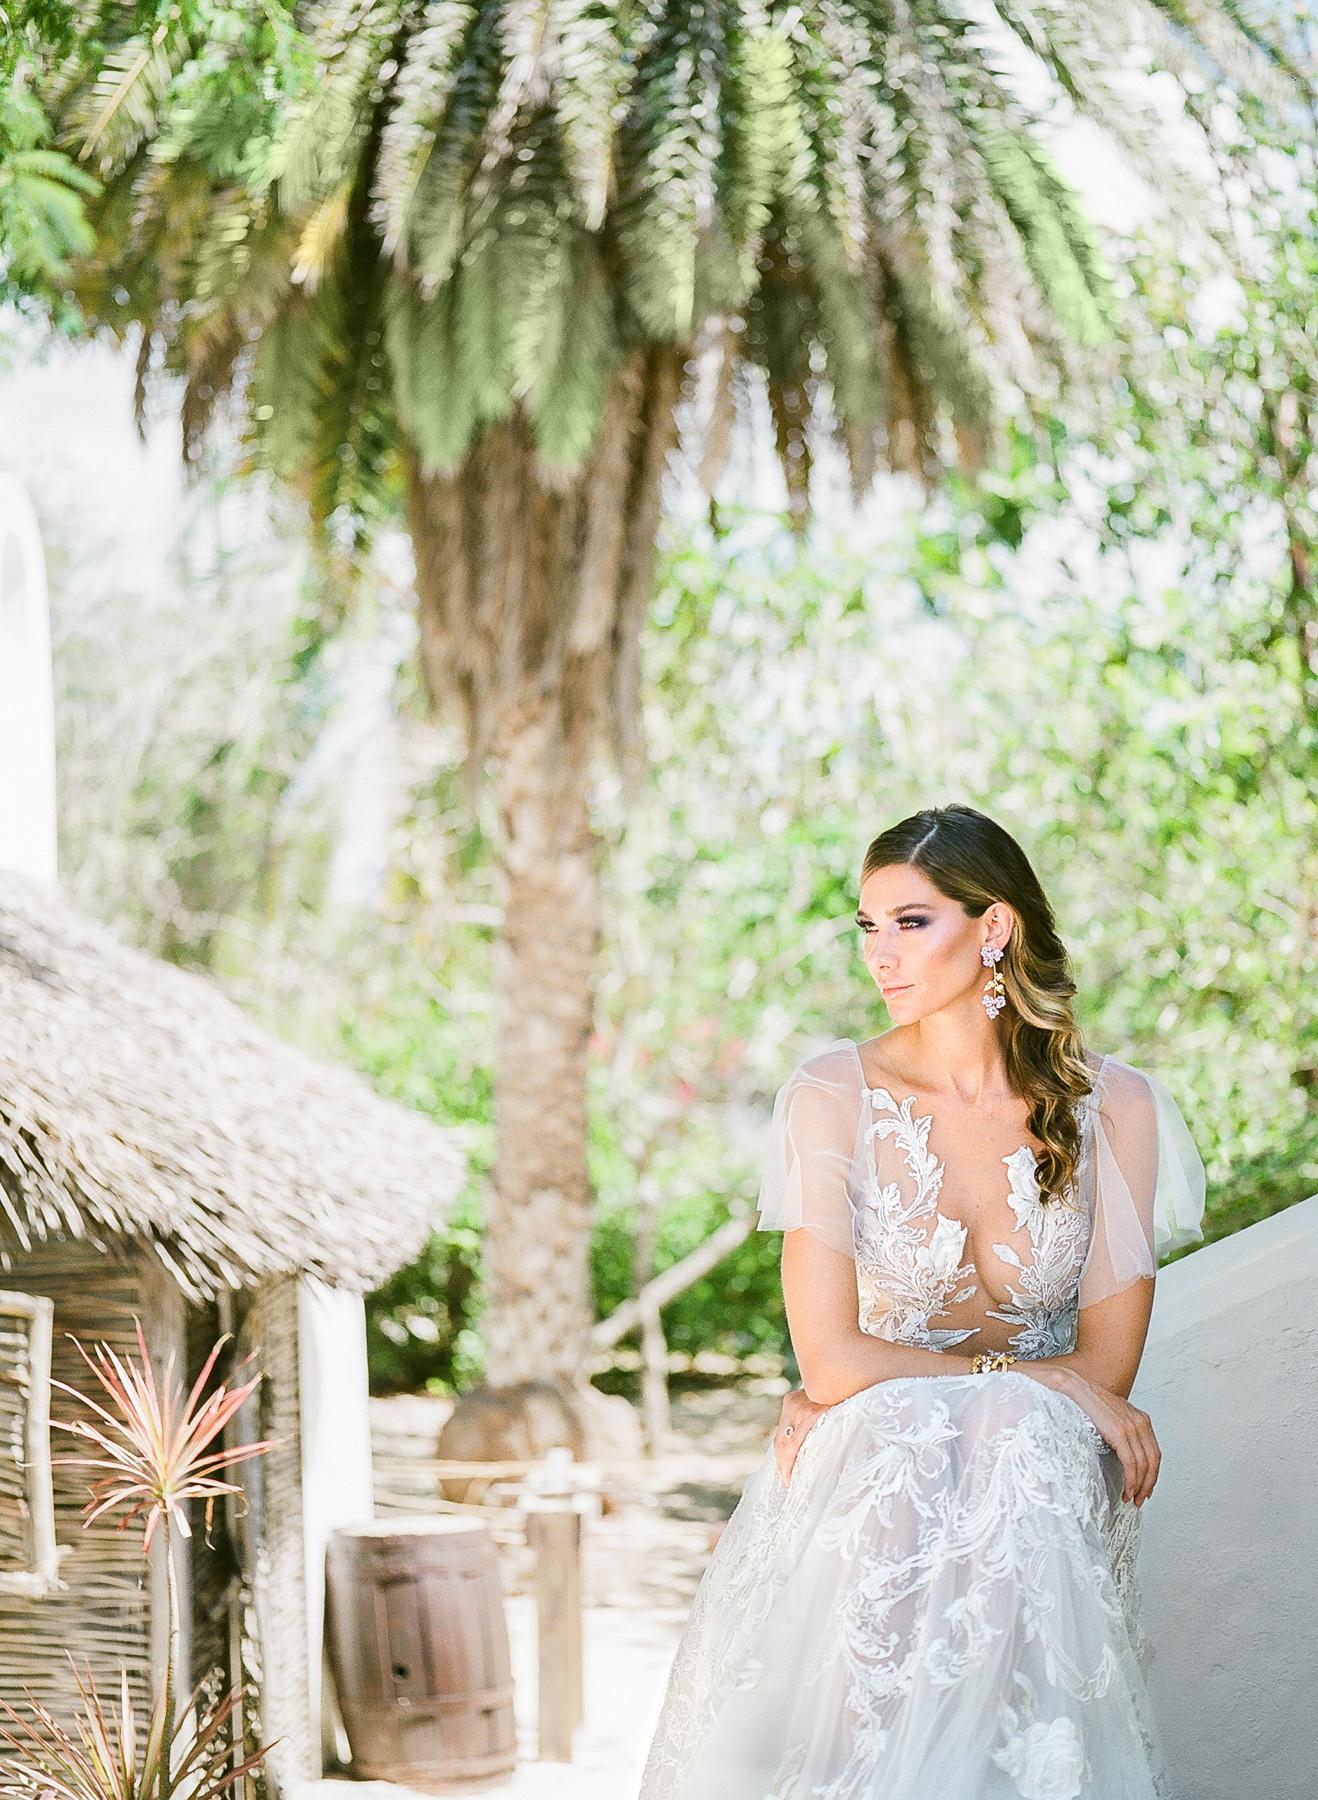 Grand-Cayman-Wedding-013.jpg